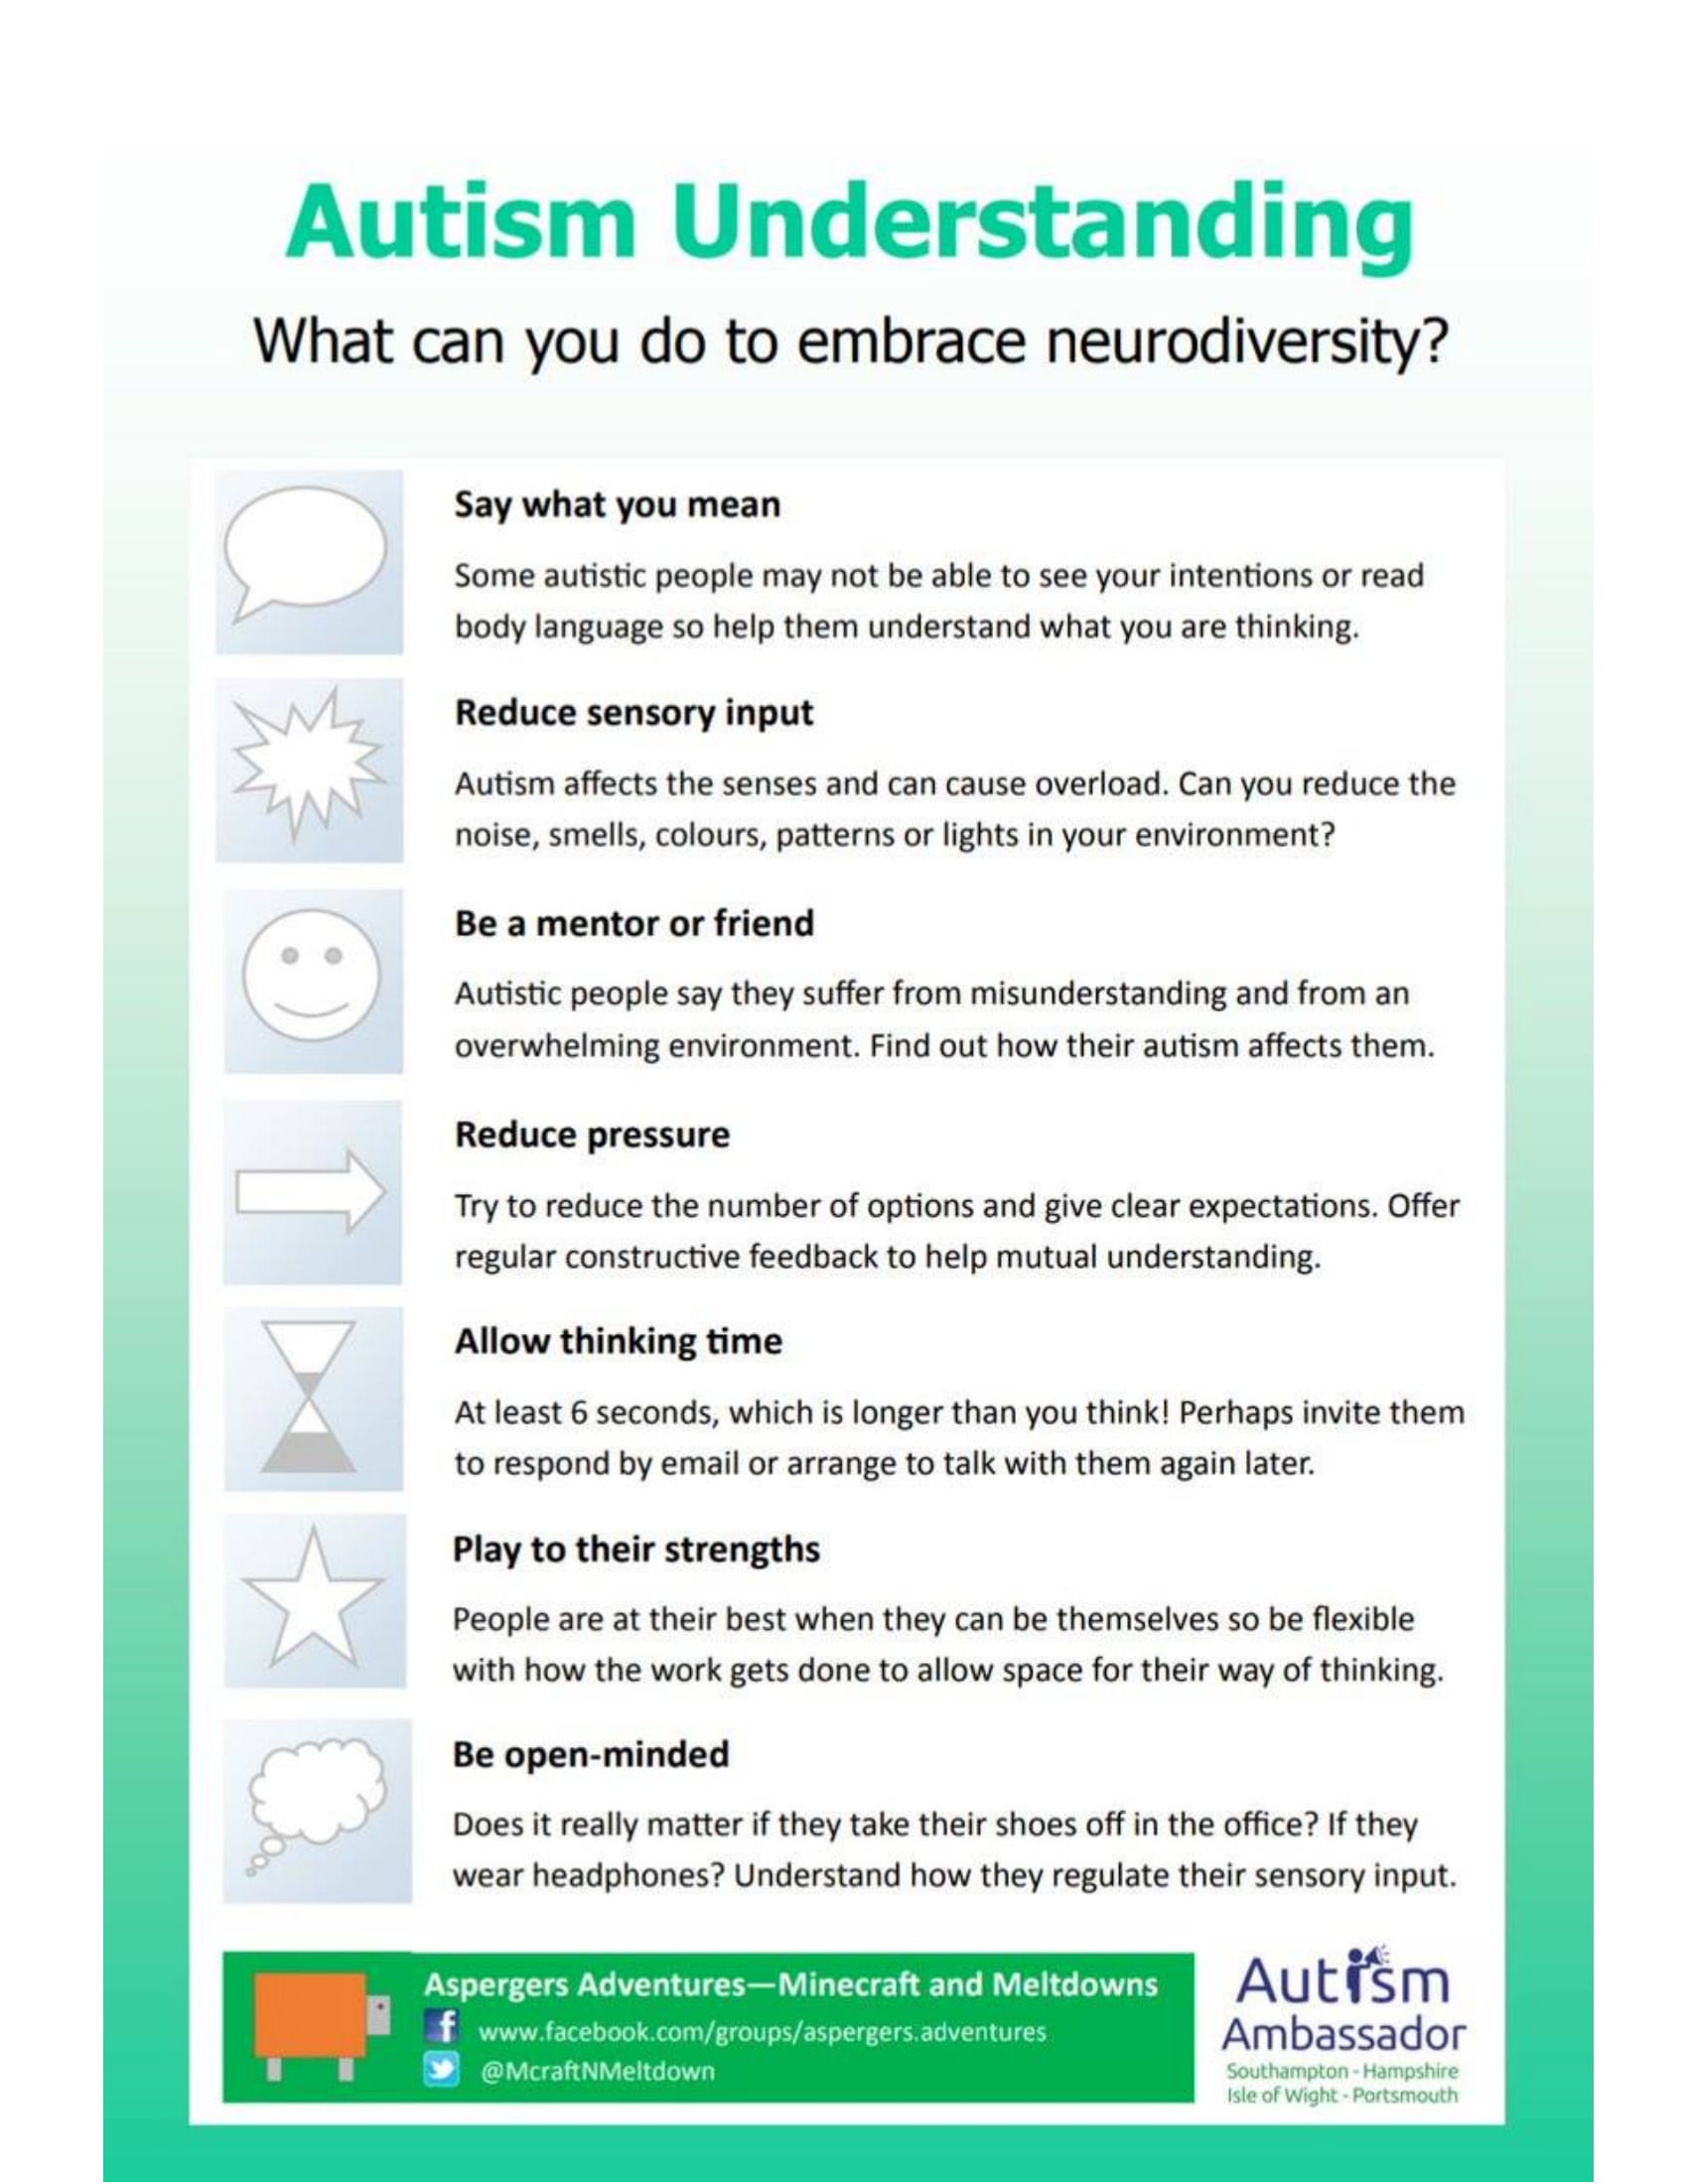 Autism Understanding - Embrace Neurodiversity - Google Docs-1.jpg